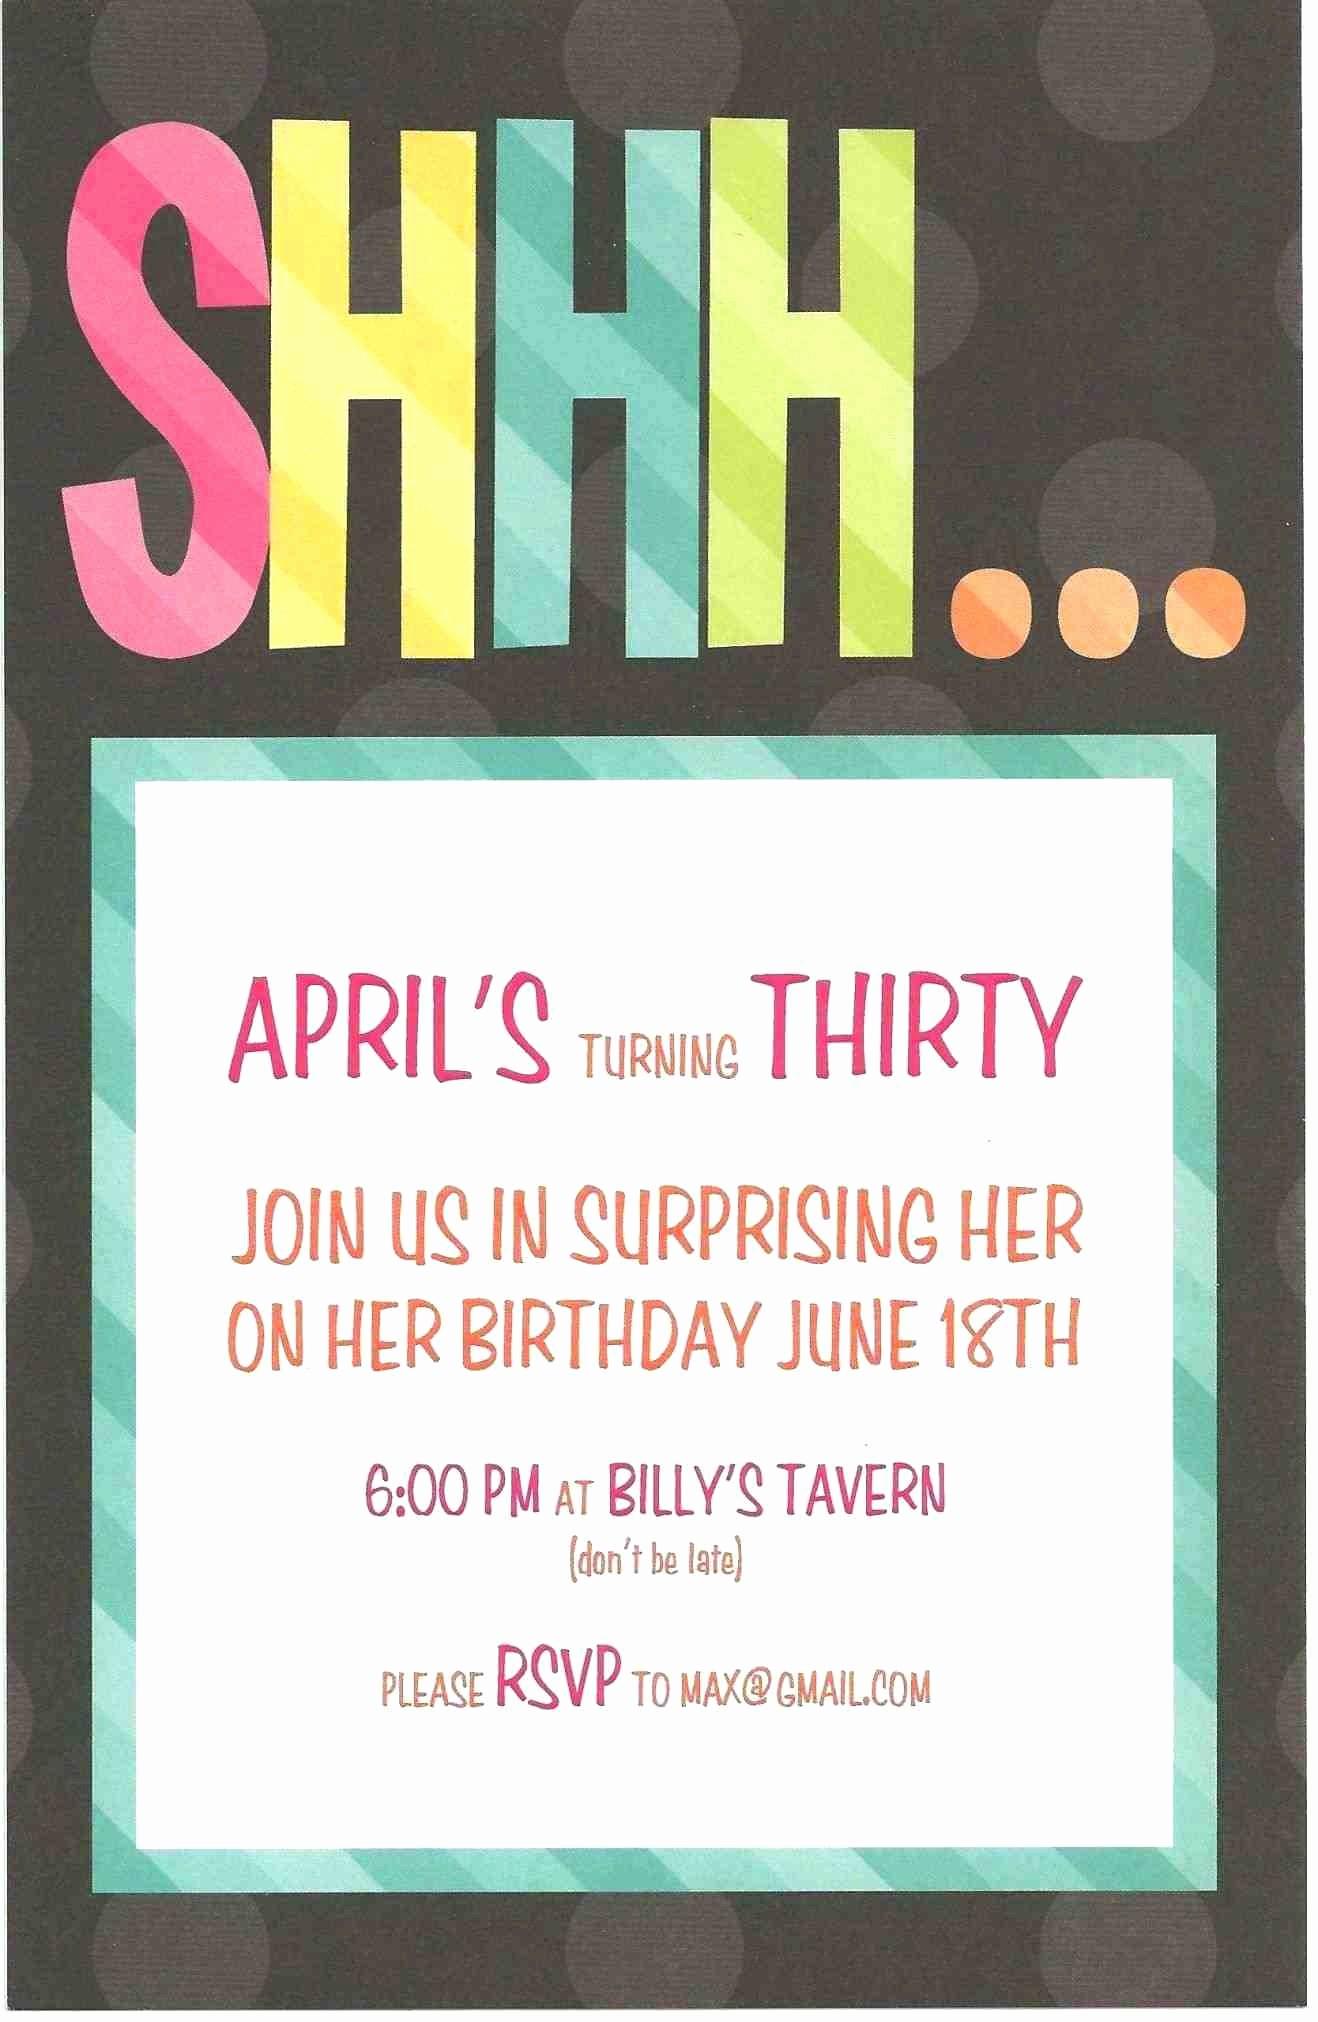 70th Birthday Invitation Templates Free Lovely Template 70th Birthday Invitations Template